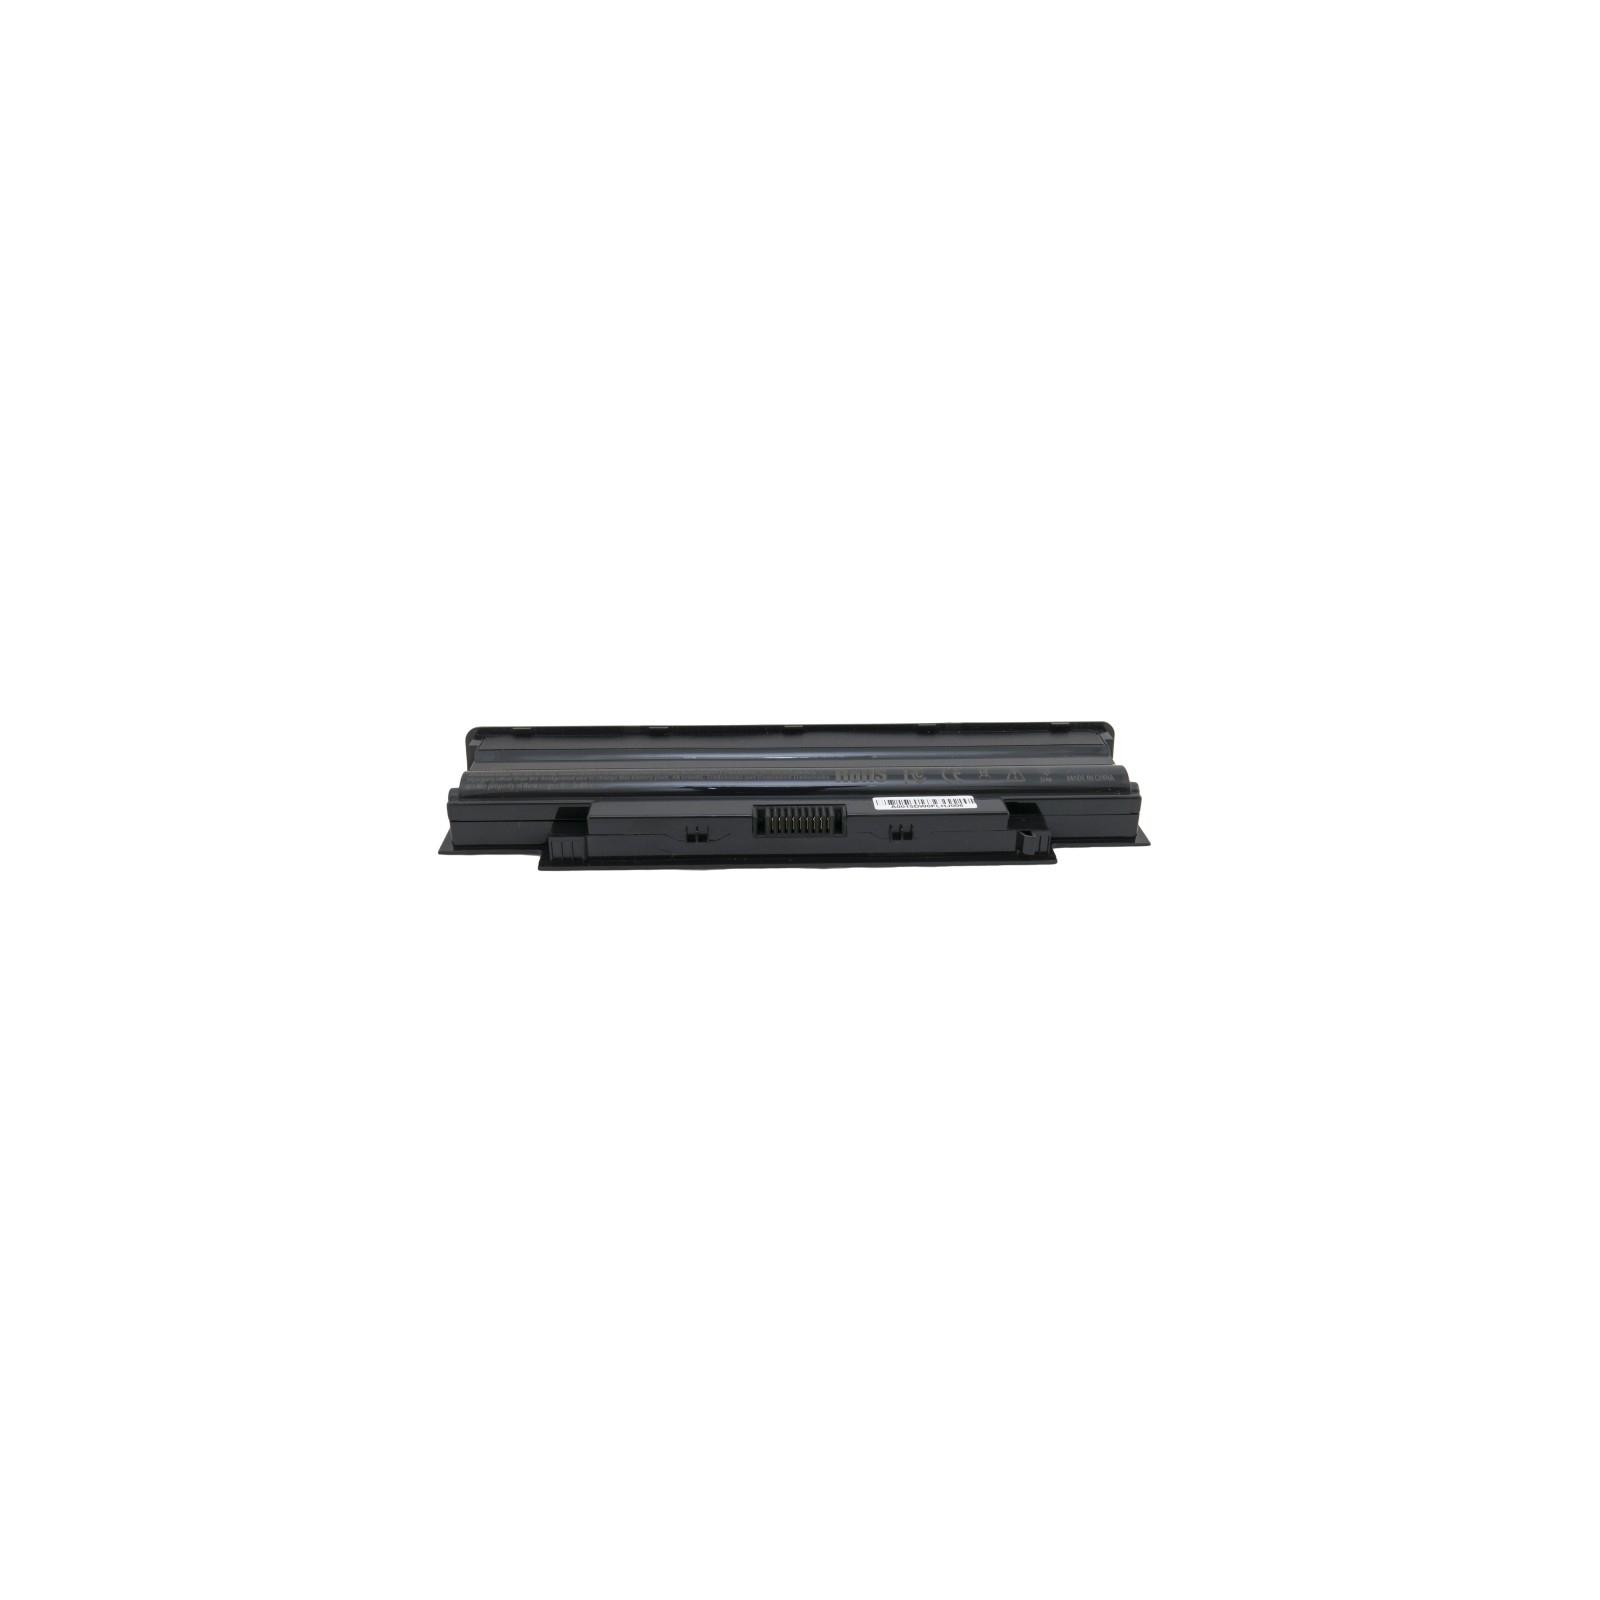 Аккумулятор для ноутбука Dell Inspiron N4010, 5200mAh EXTRADIGITAL (BND3934) изображение 4